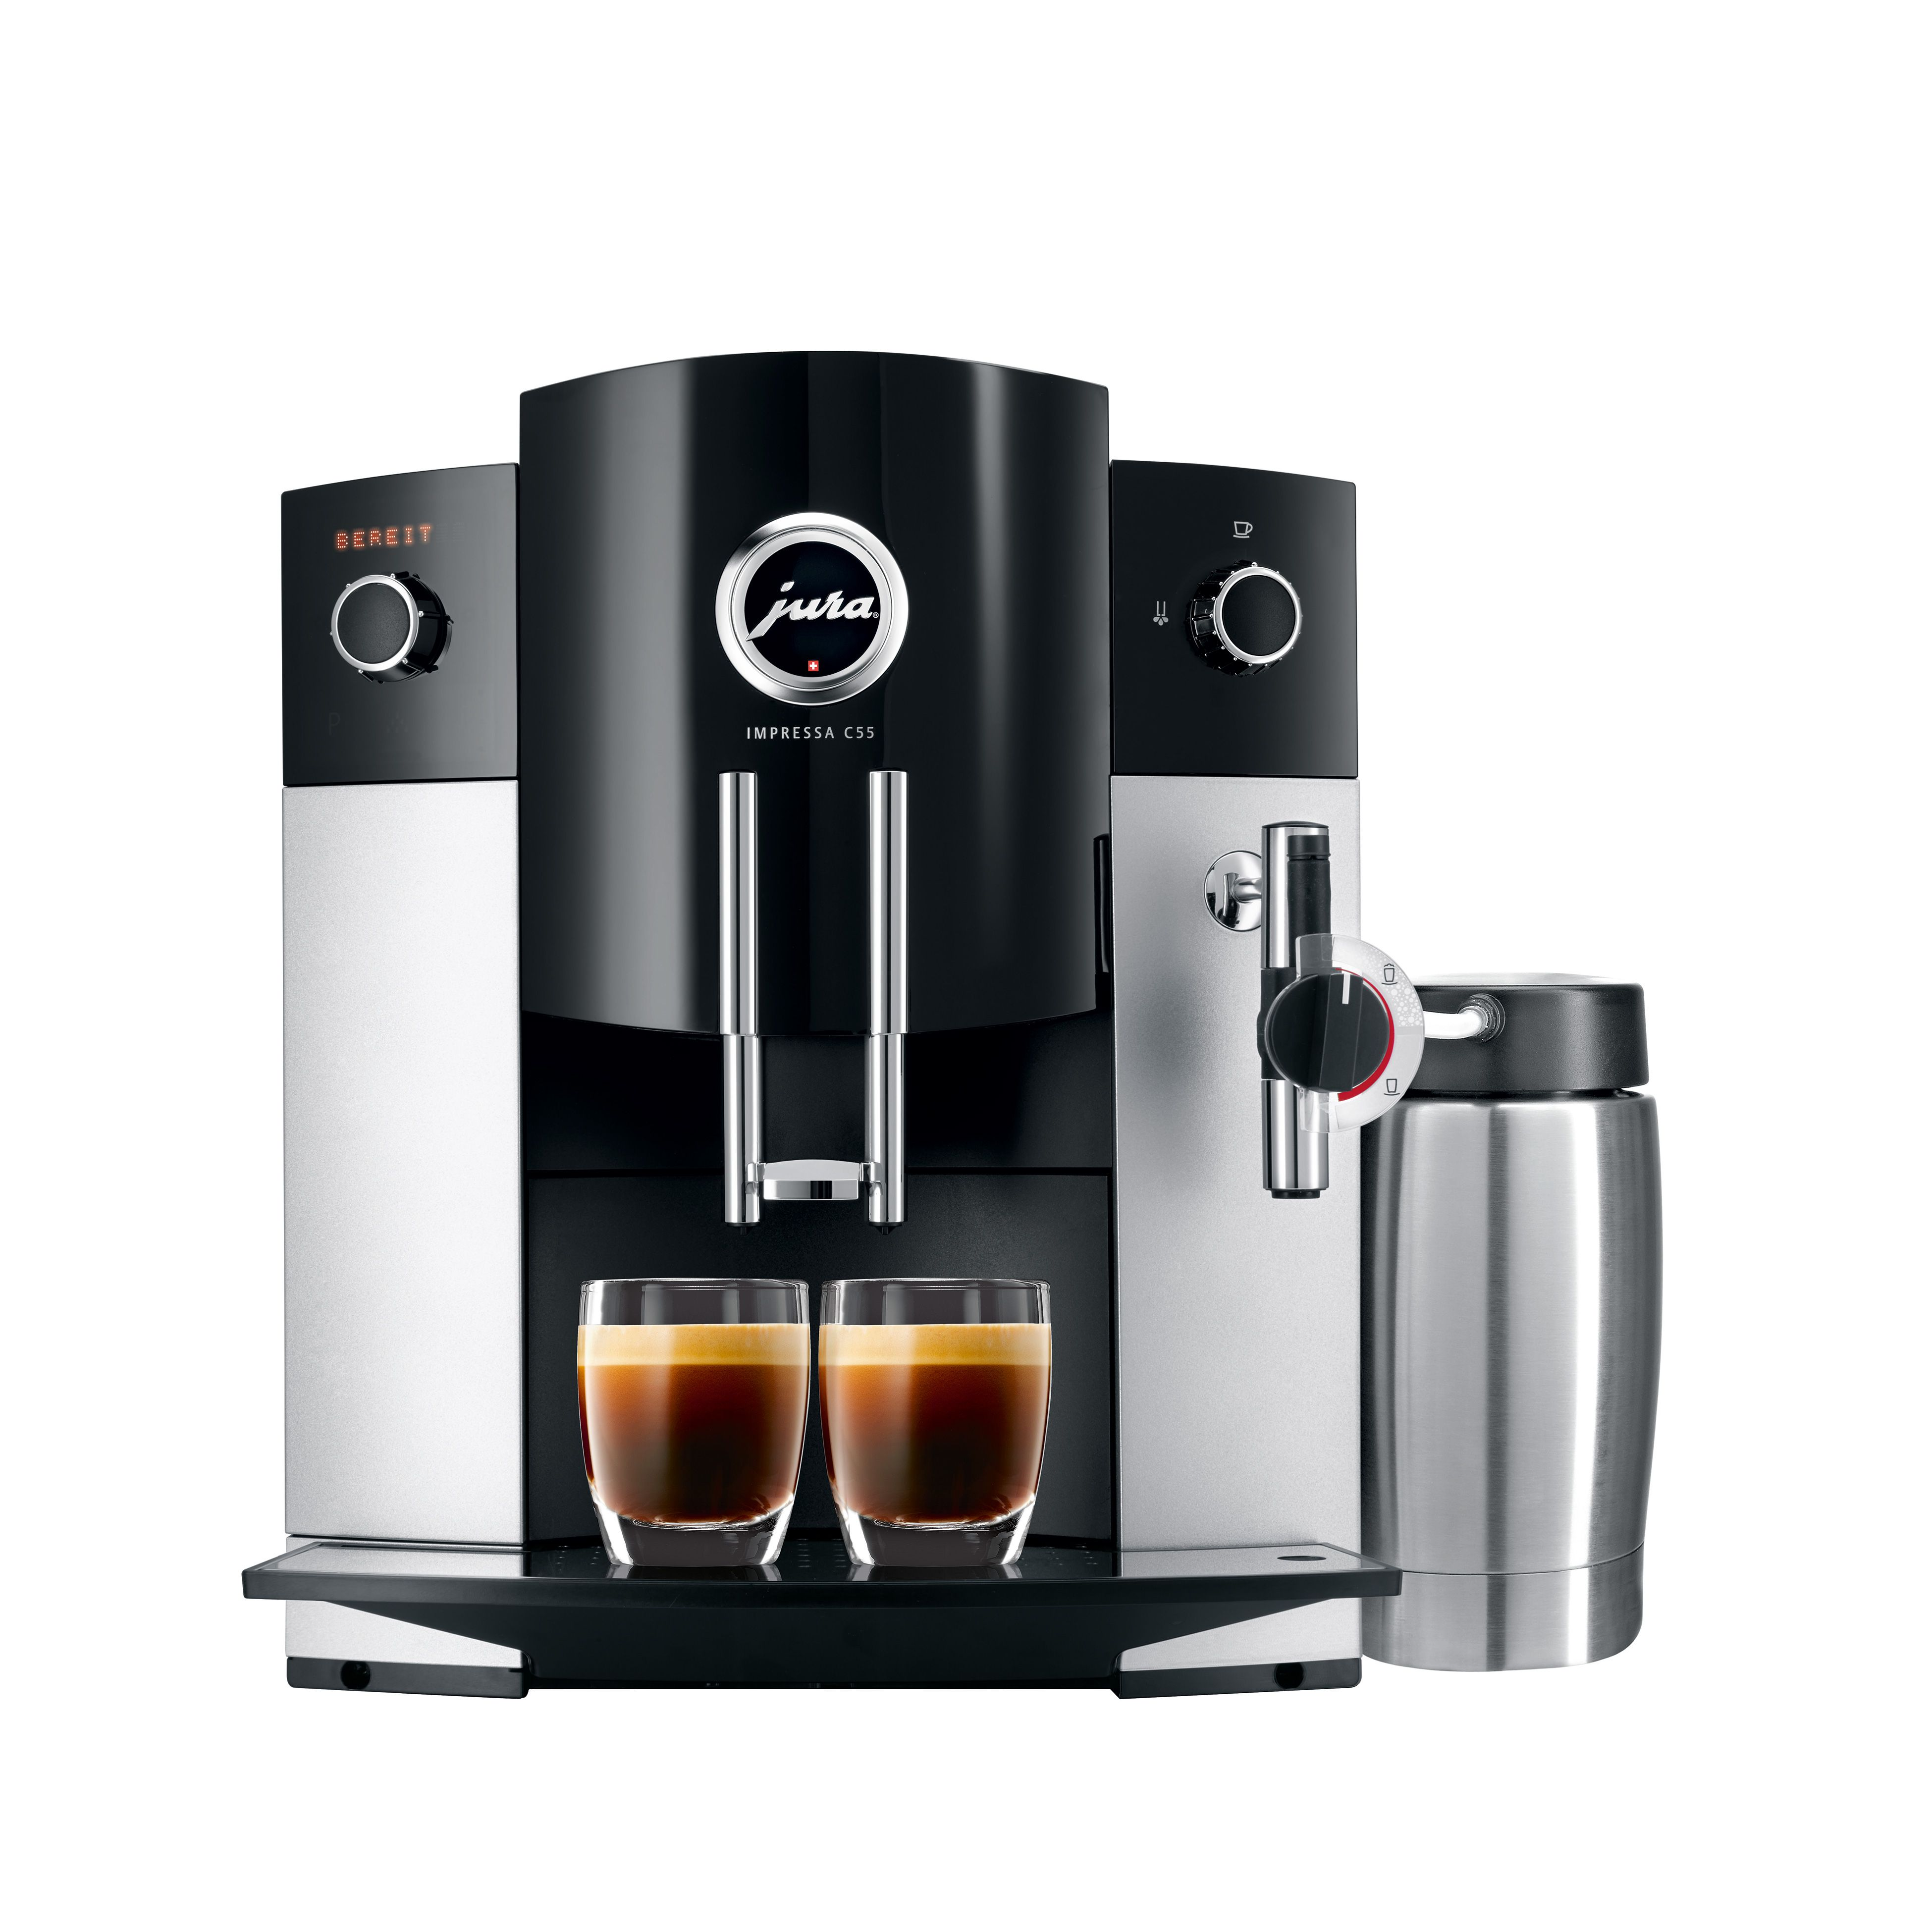 Impressa C65 Automatic coffee machine, Coffee machine